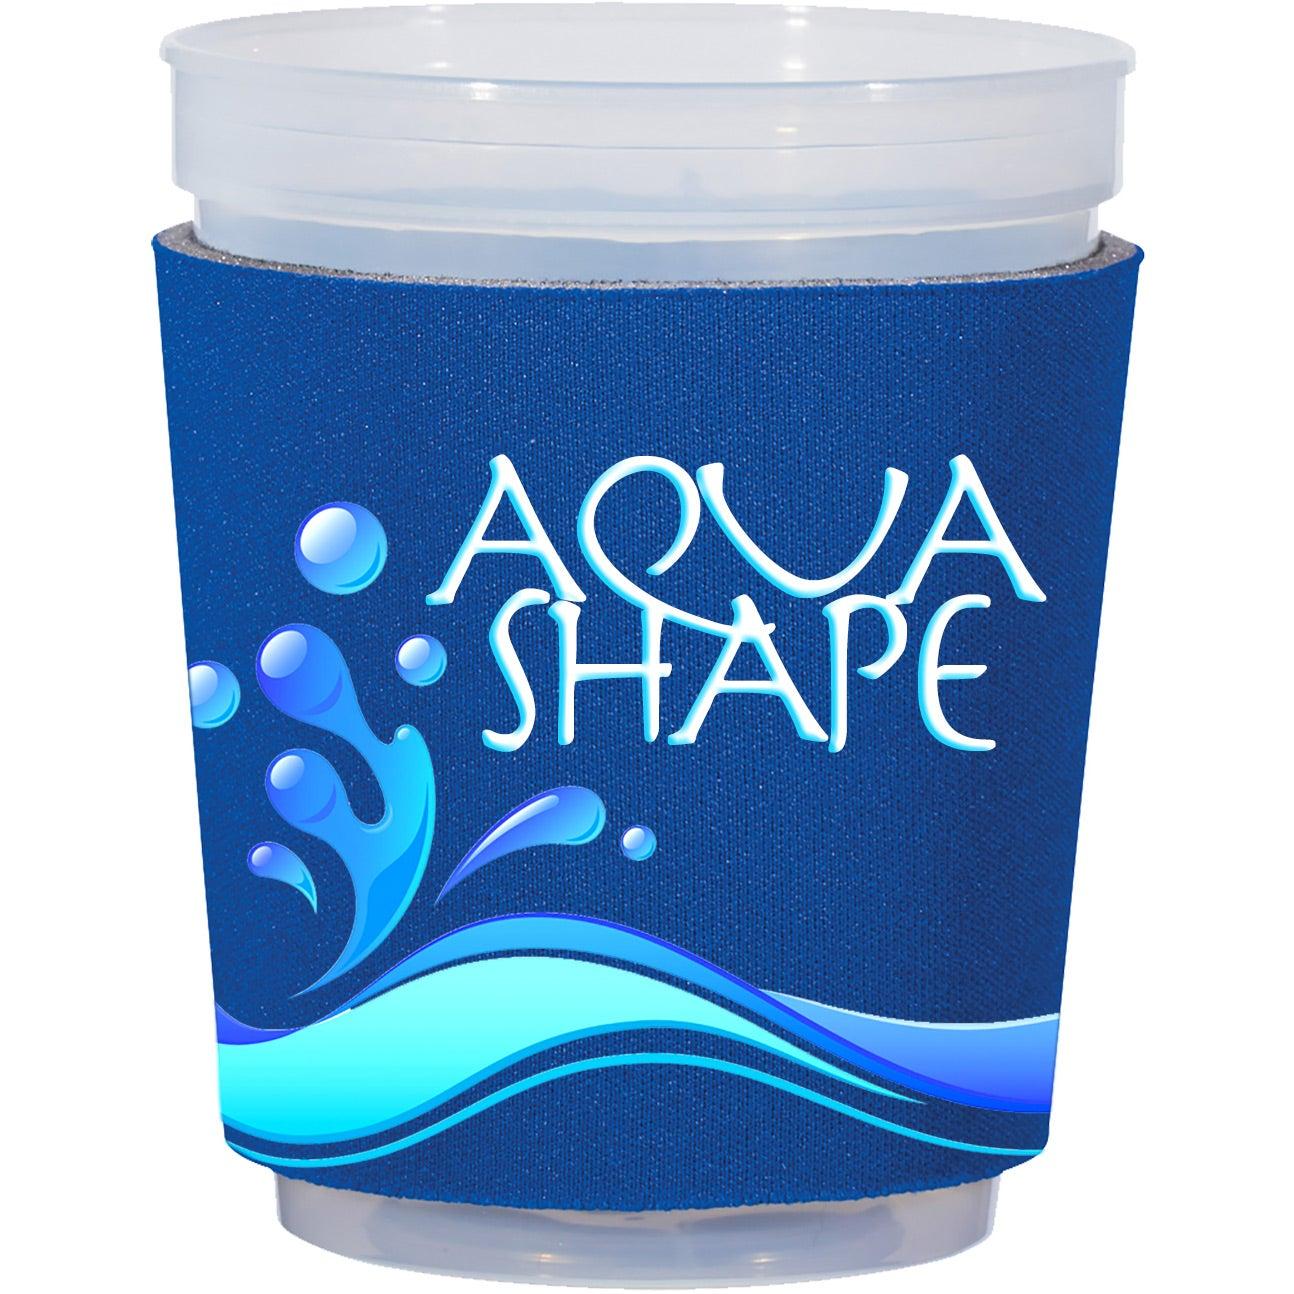 Kan-Tastic Cup Sleeve